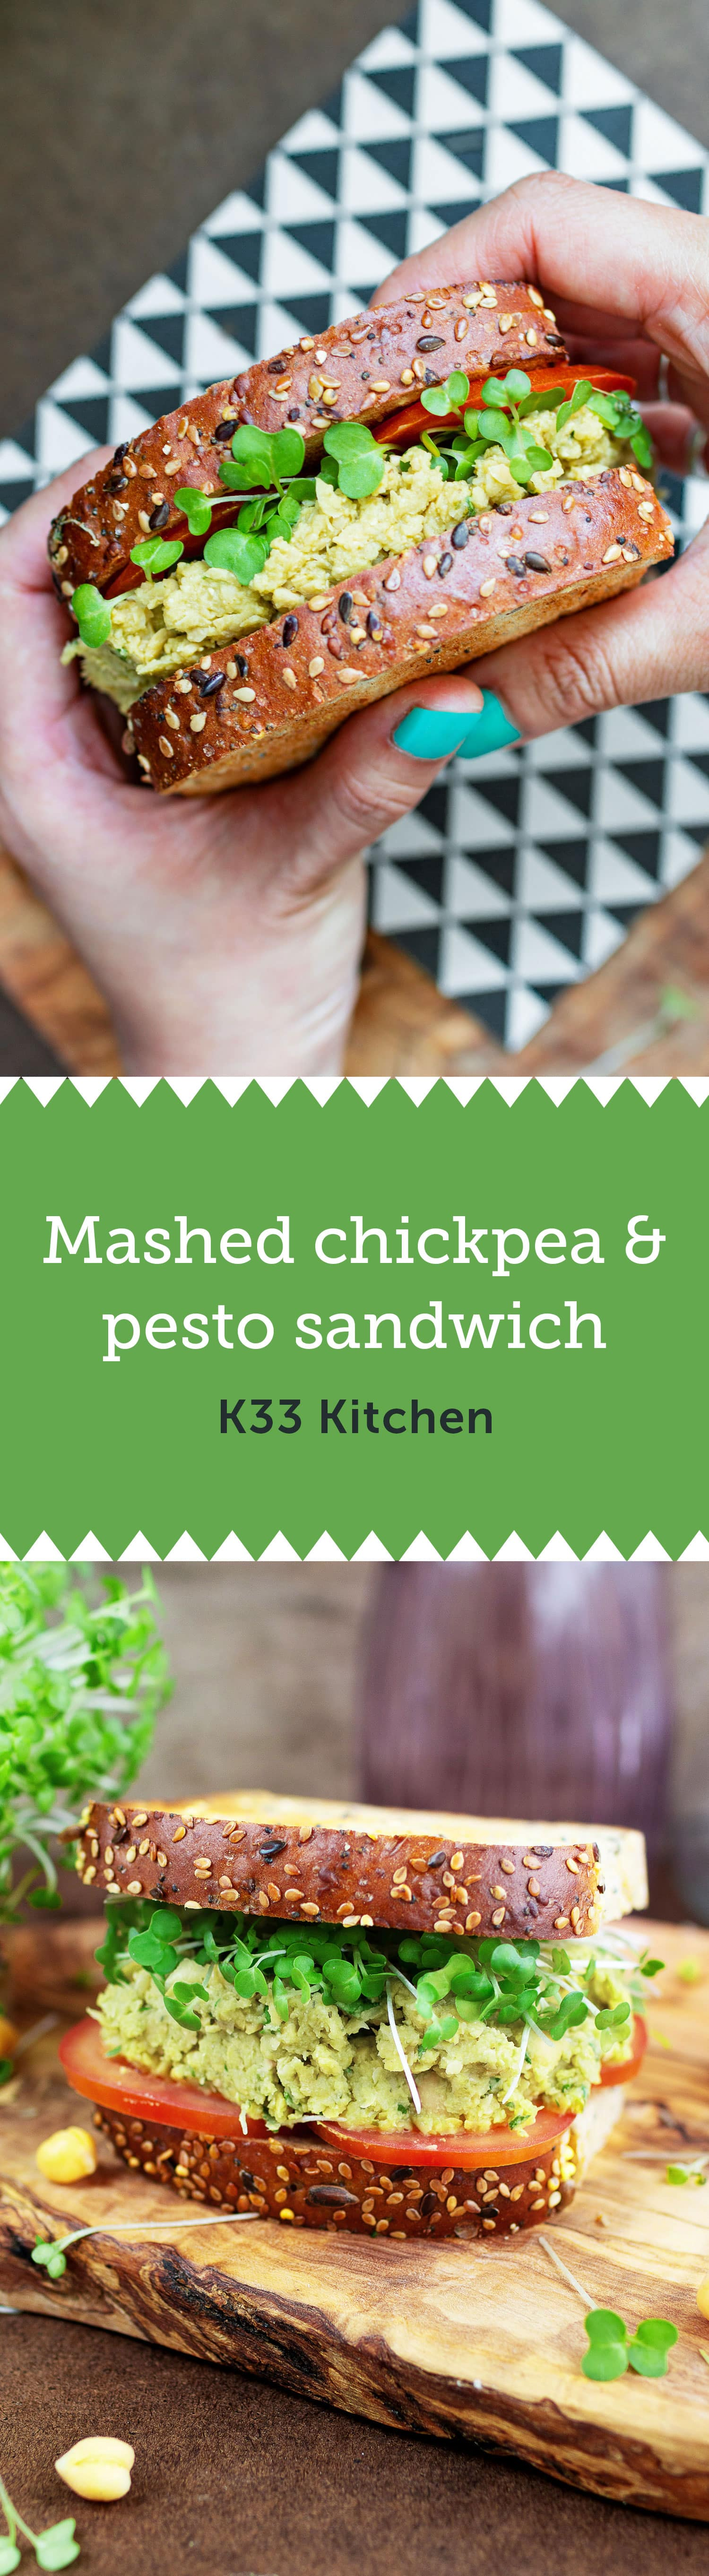 Mashed chickpea pesto sandwich